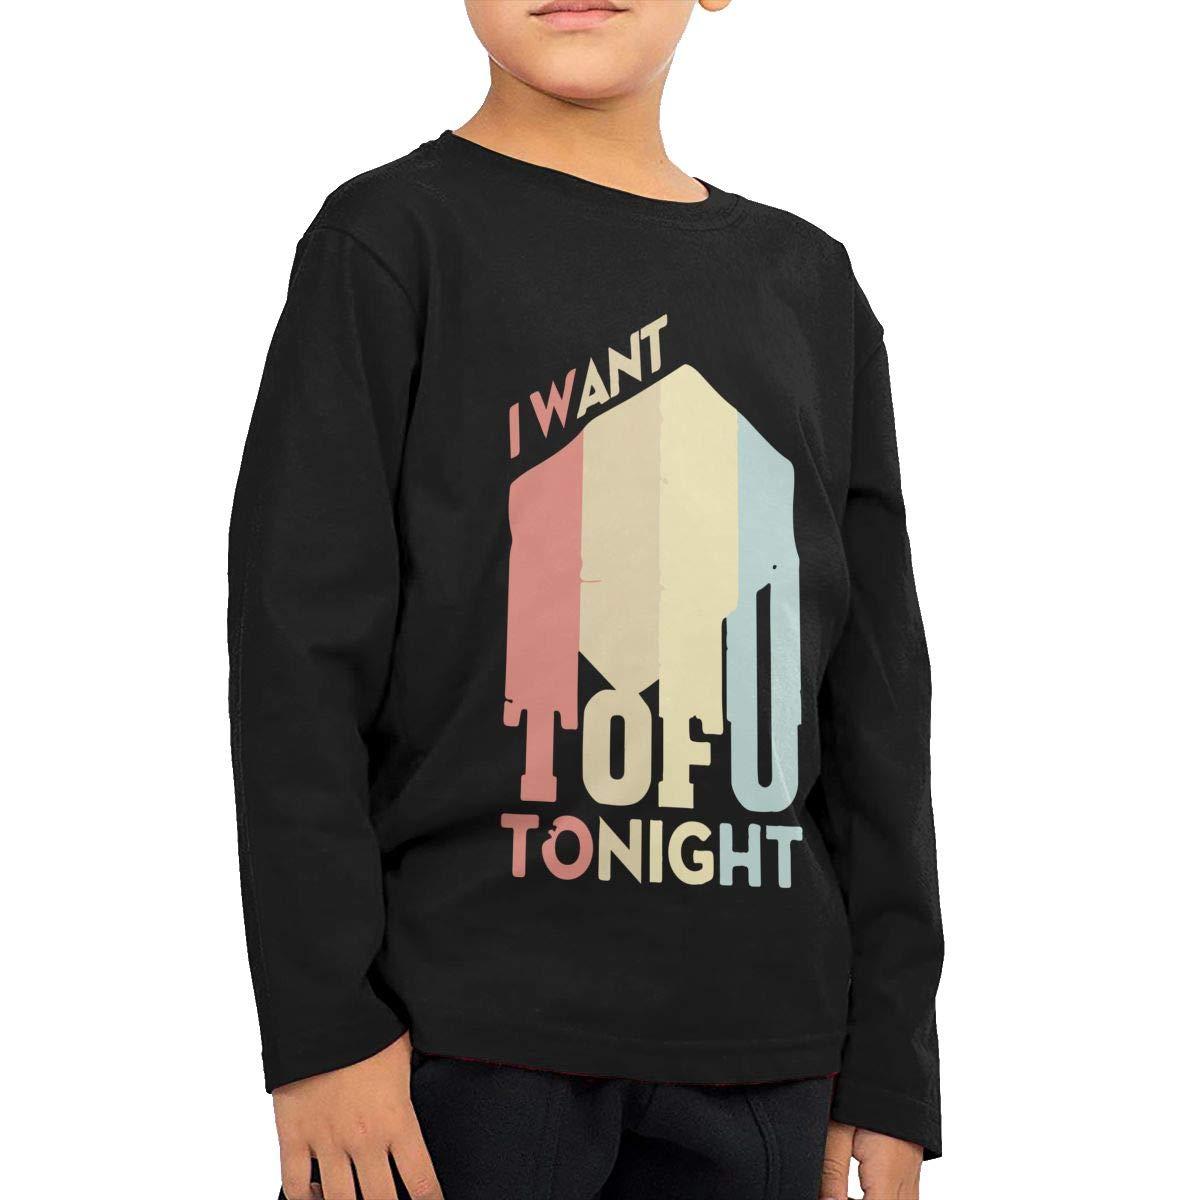 I Want Tofu Tonight Retro Vegan Fashion Toddler Children Baby Boys Girls Long Sleeve T Shirts Tops